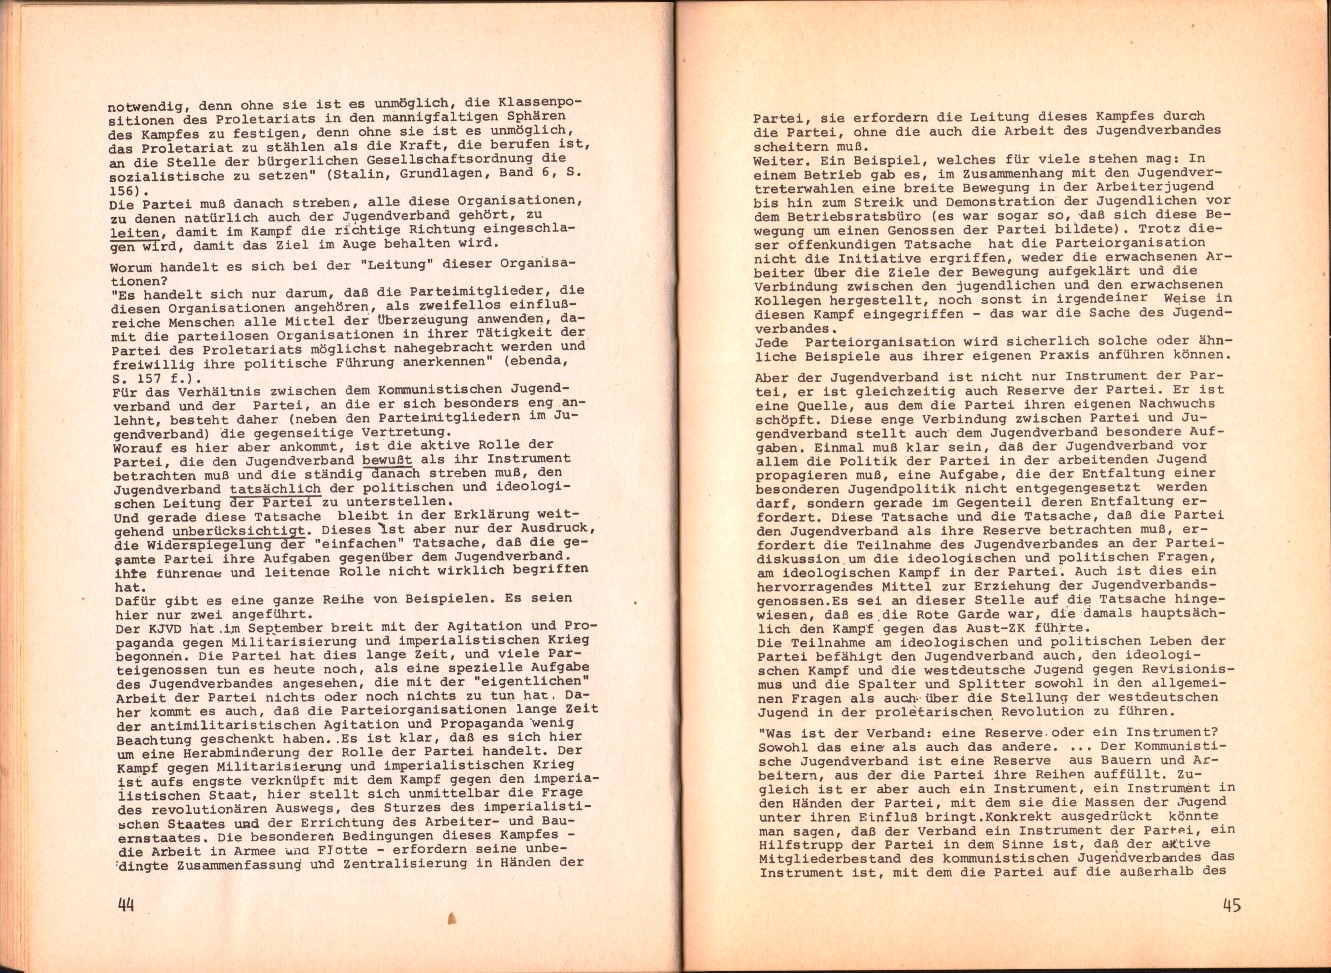 ZB_Parteiarbeiter_1971_10_24